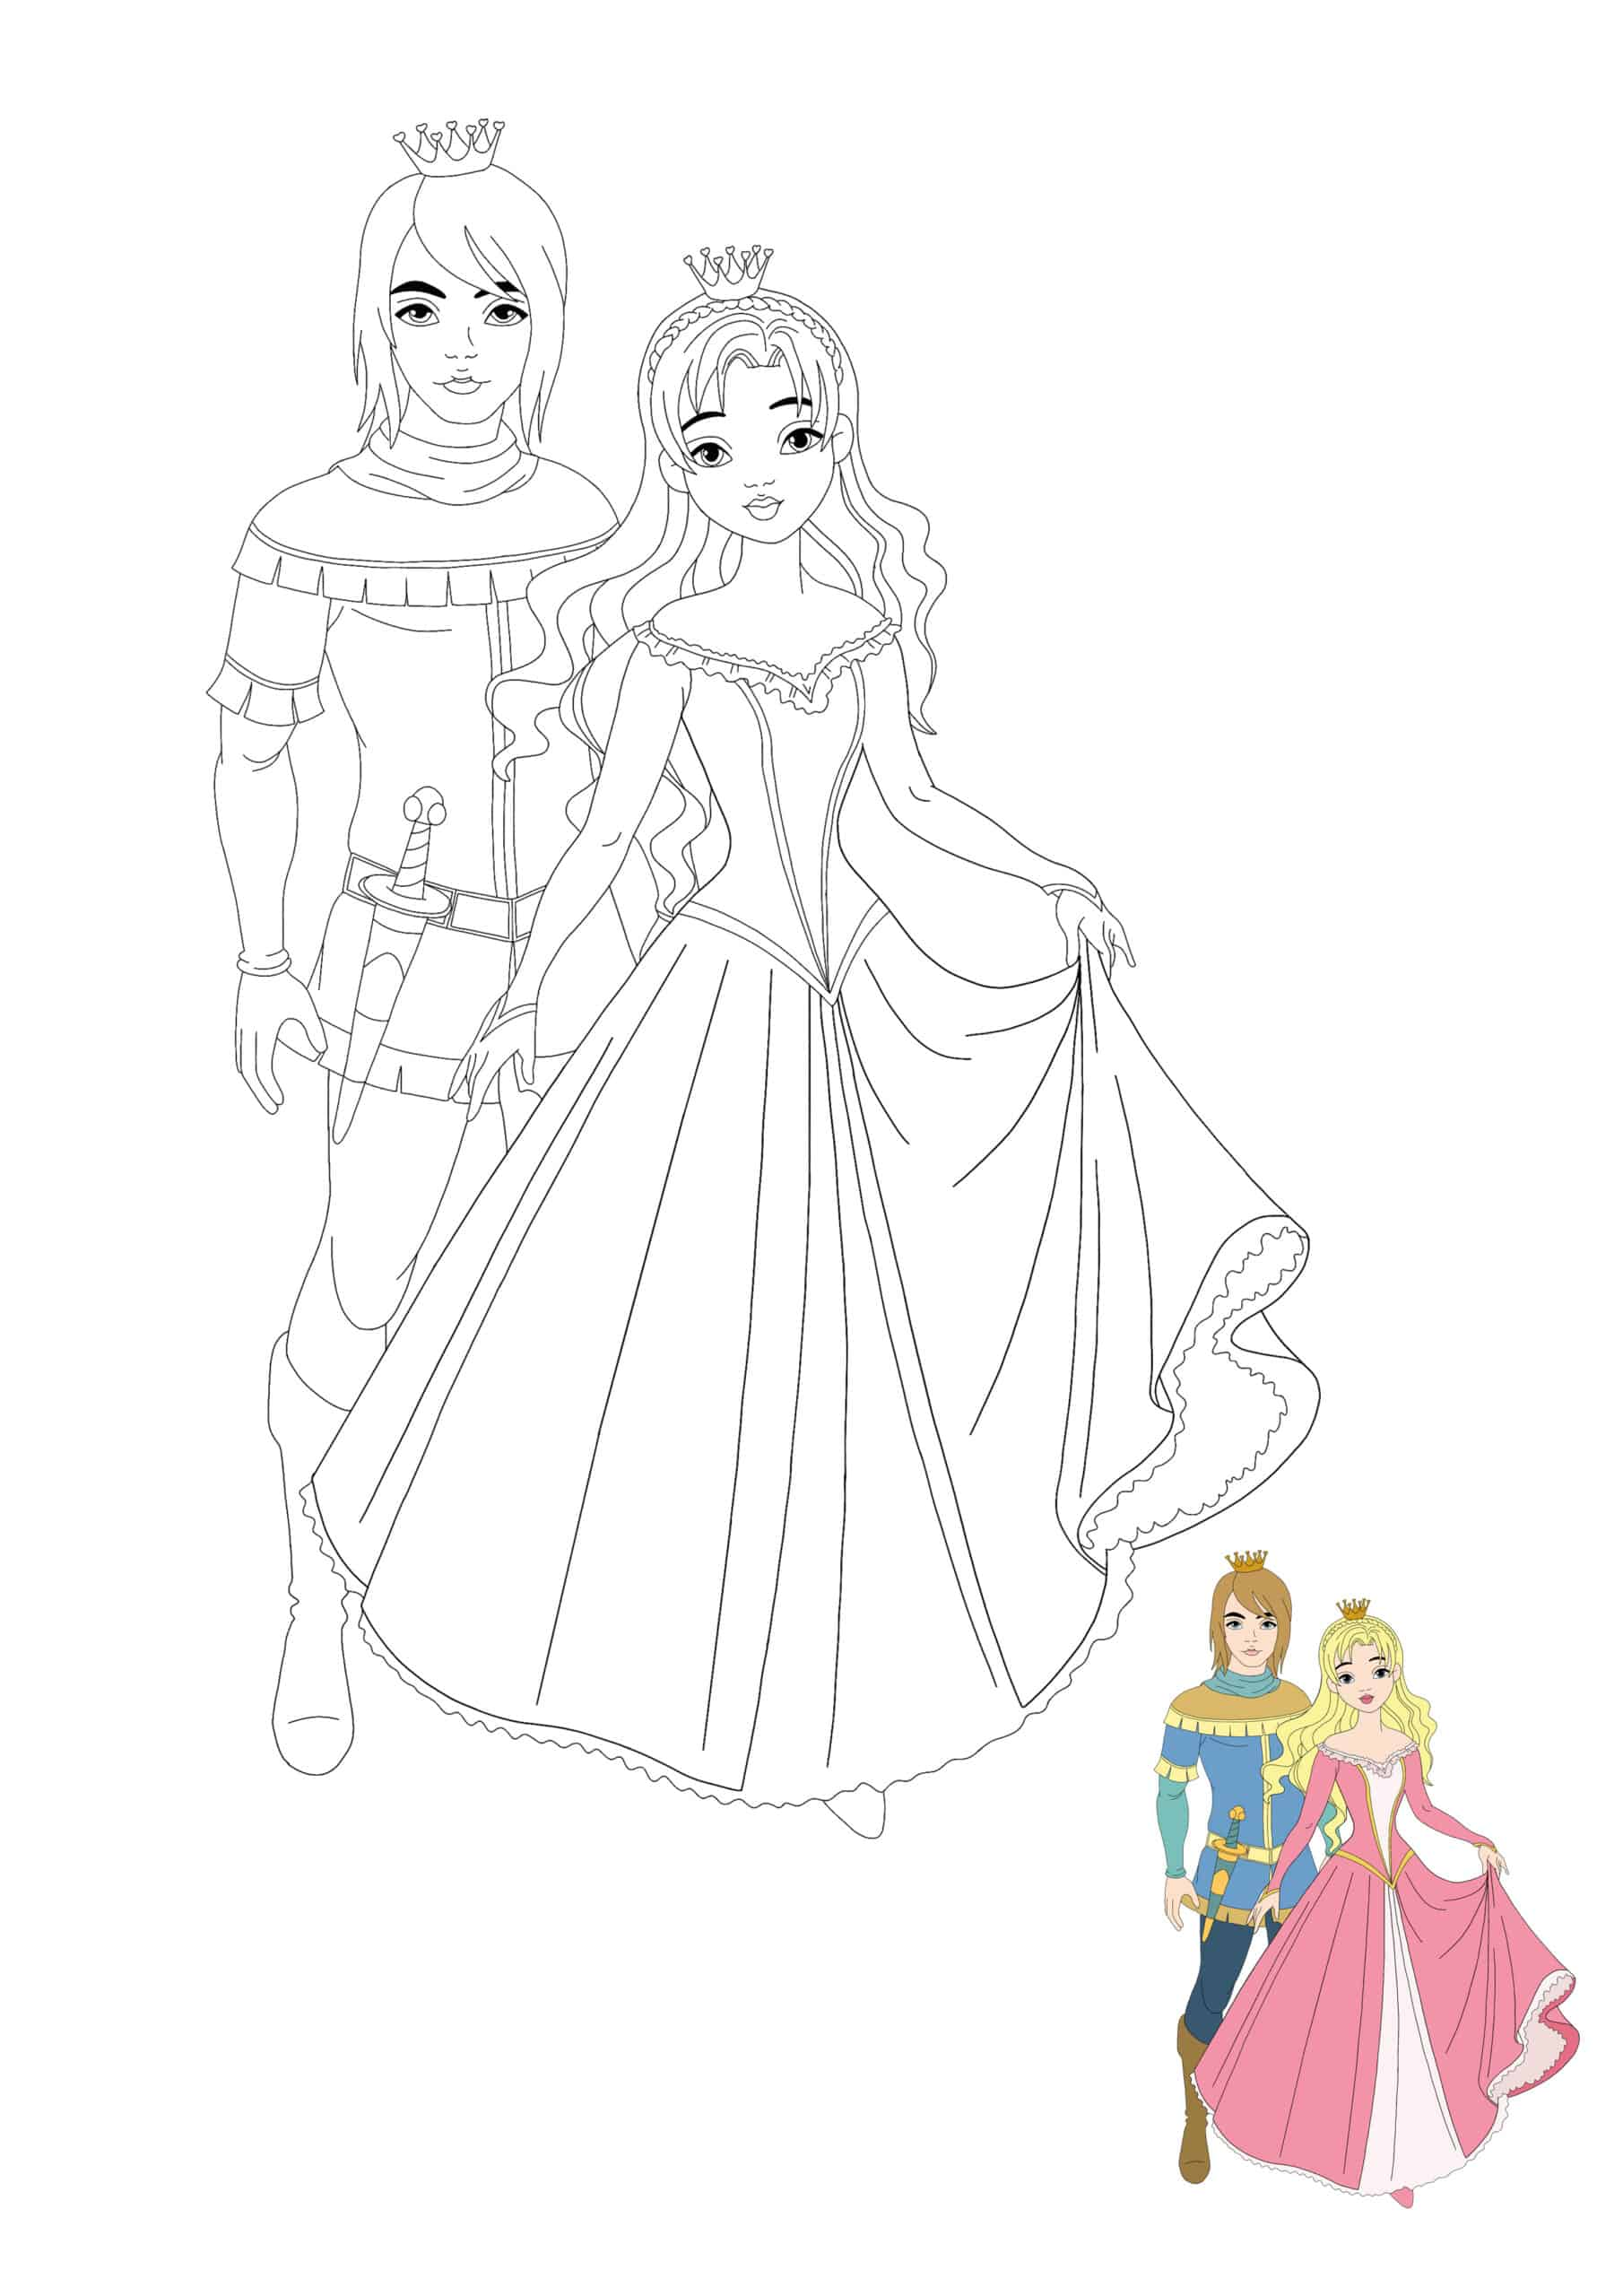 Prince and Princess colouring page